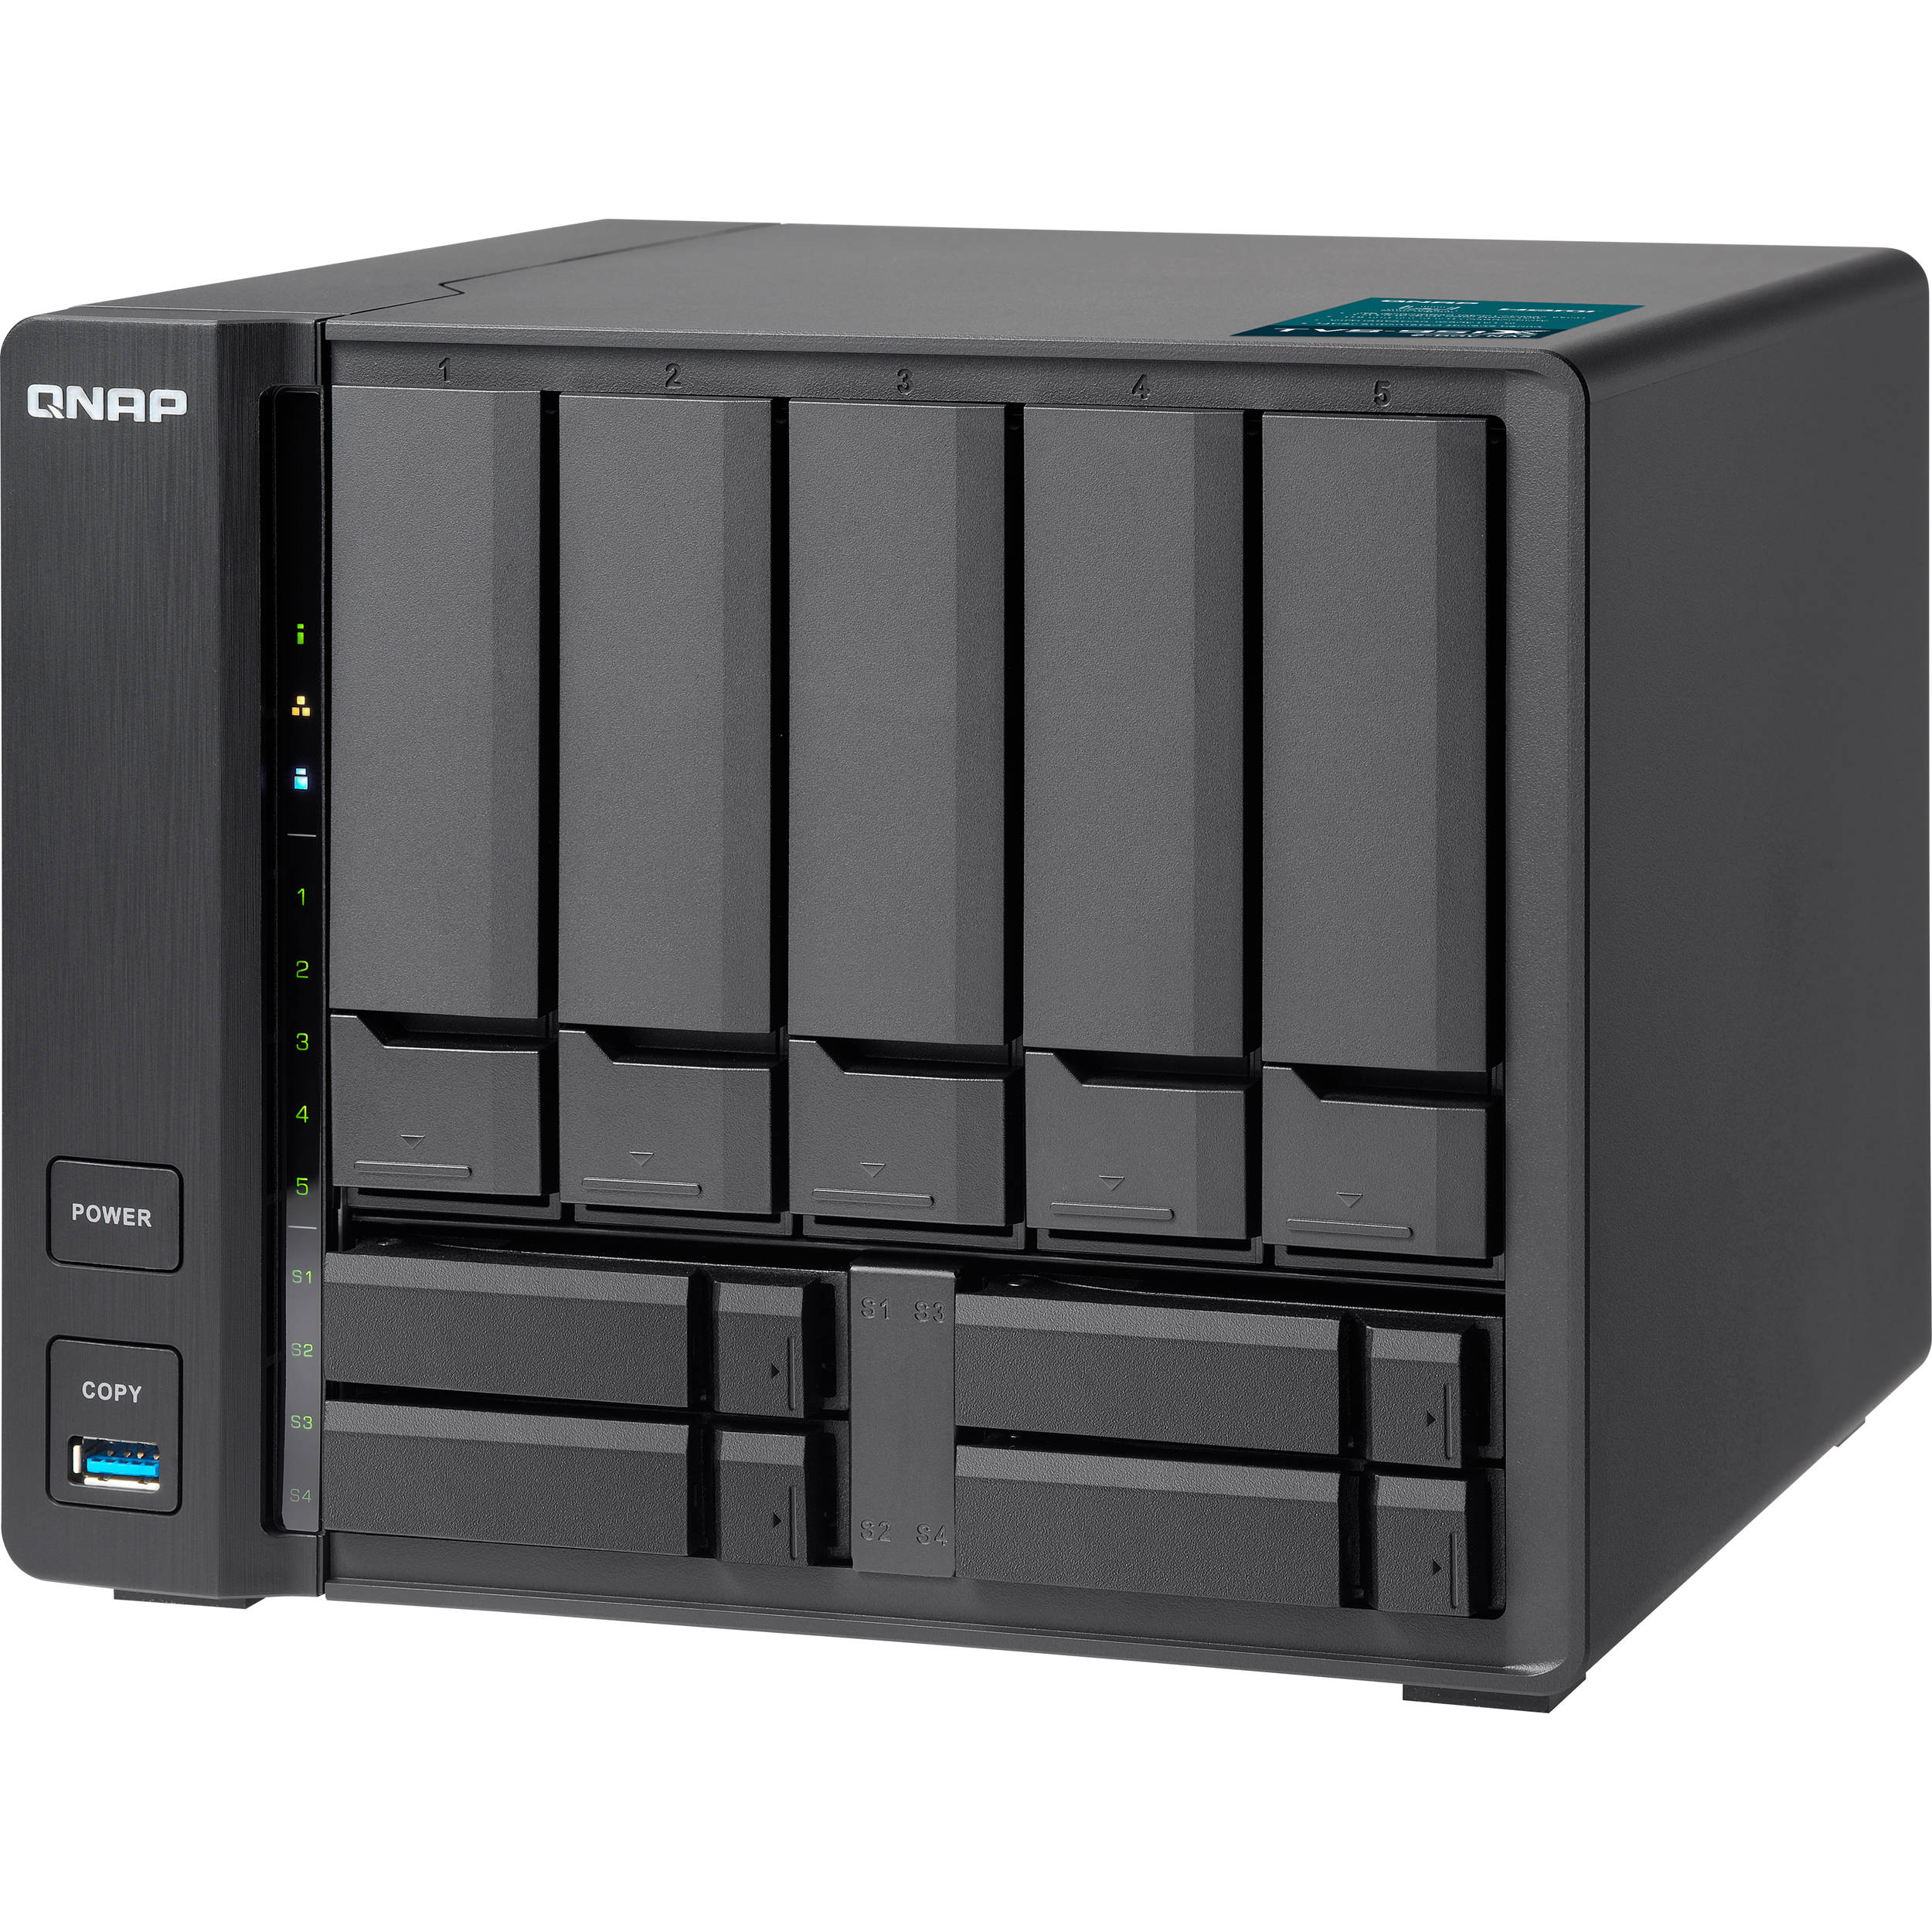 QNAP TVS-951X 9-Bay NAS Enclosure